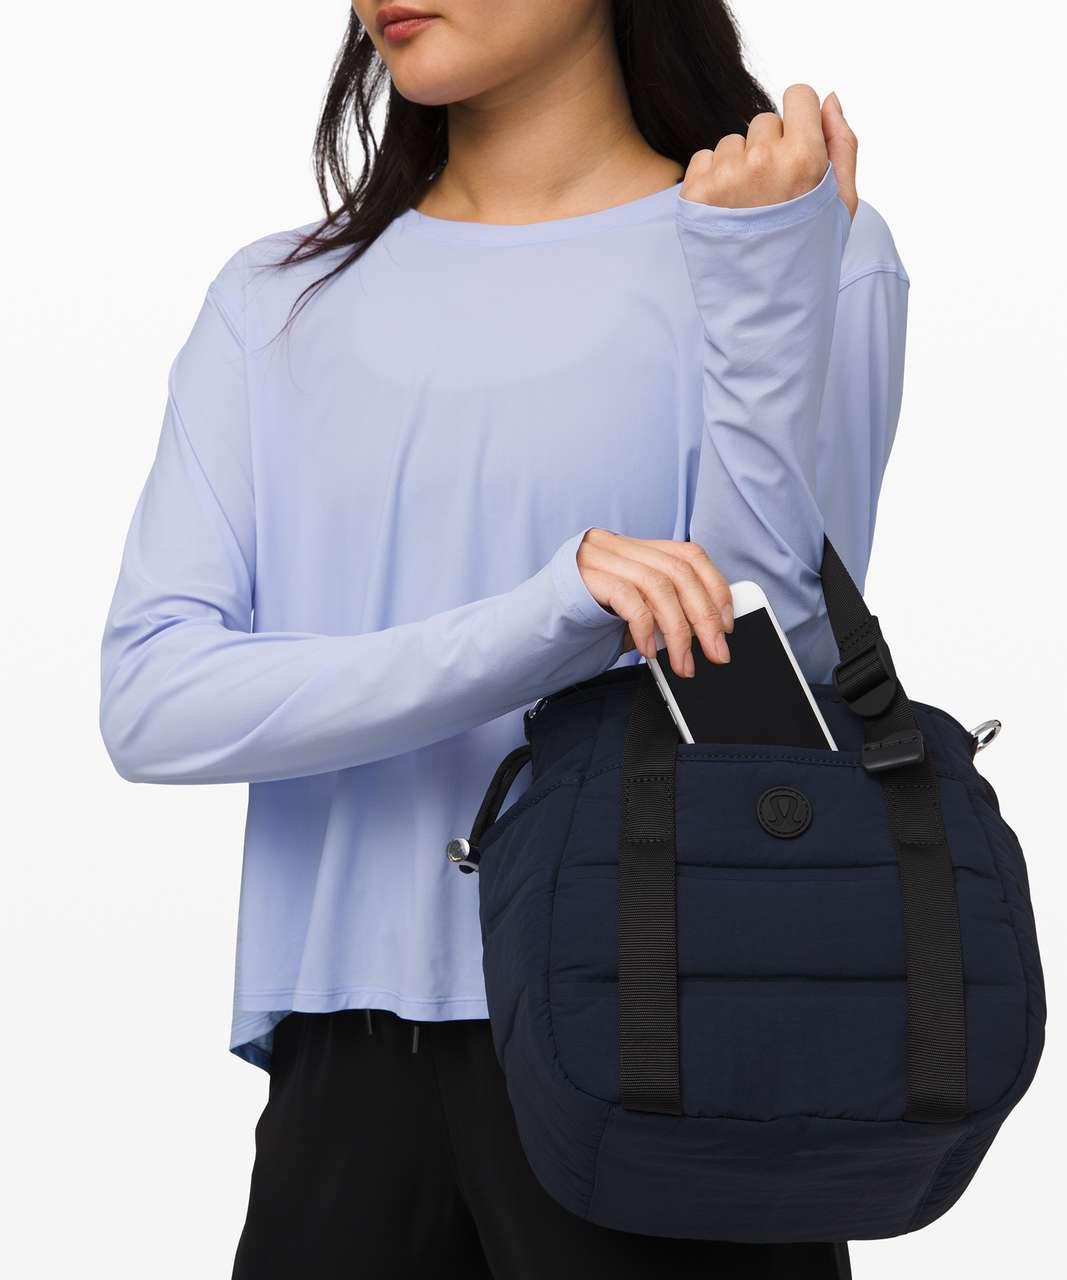 Lululemon Dash All Day Bucket Bag *6.5L - True Navy